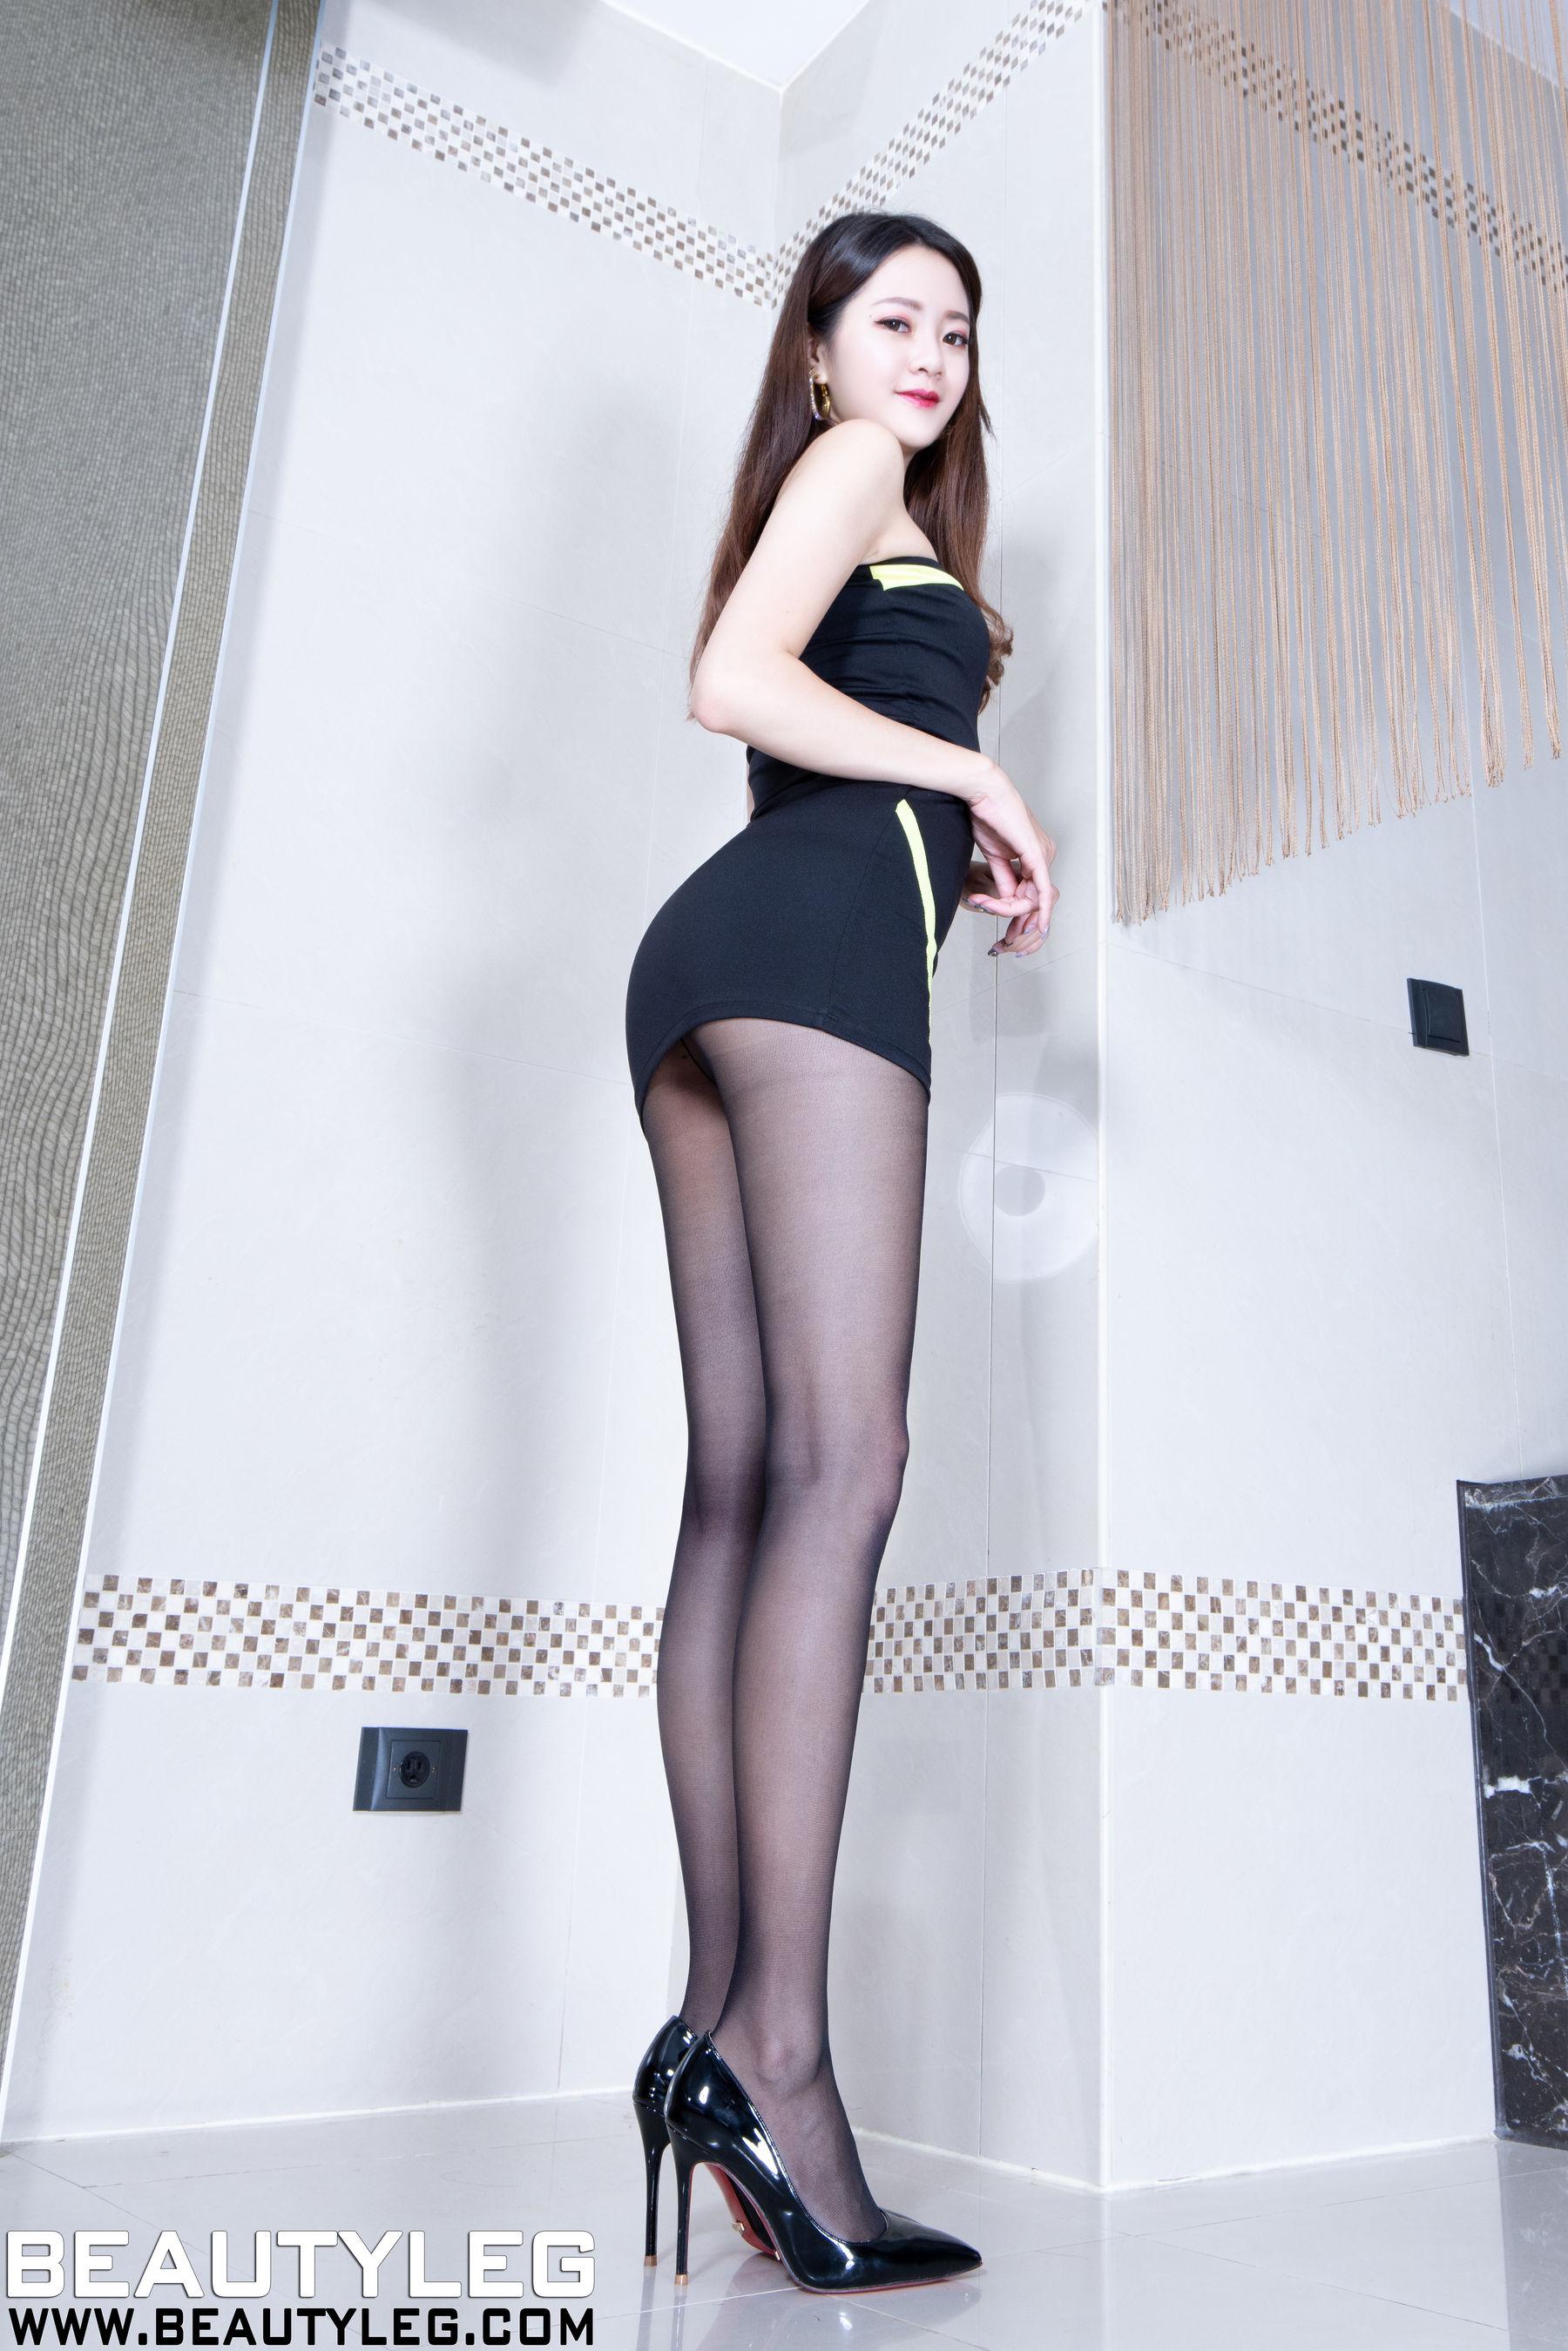 VOL.1827 [Beautyleg]高跟美腿:腿模Una(Beautyleg Una)超高清个人性感漂亮大图(45P)